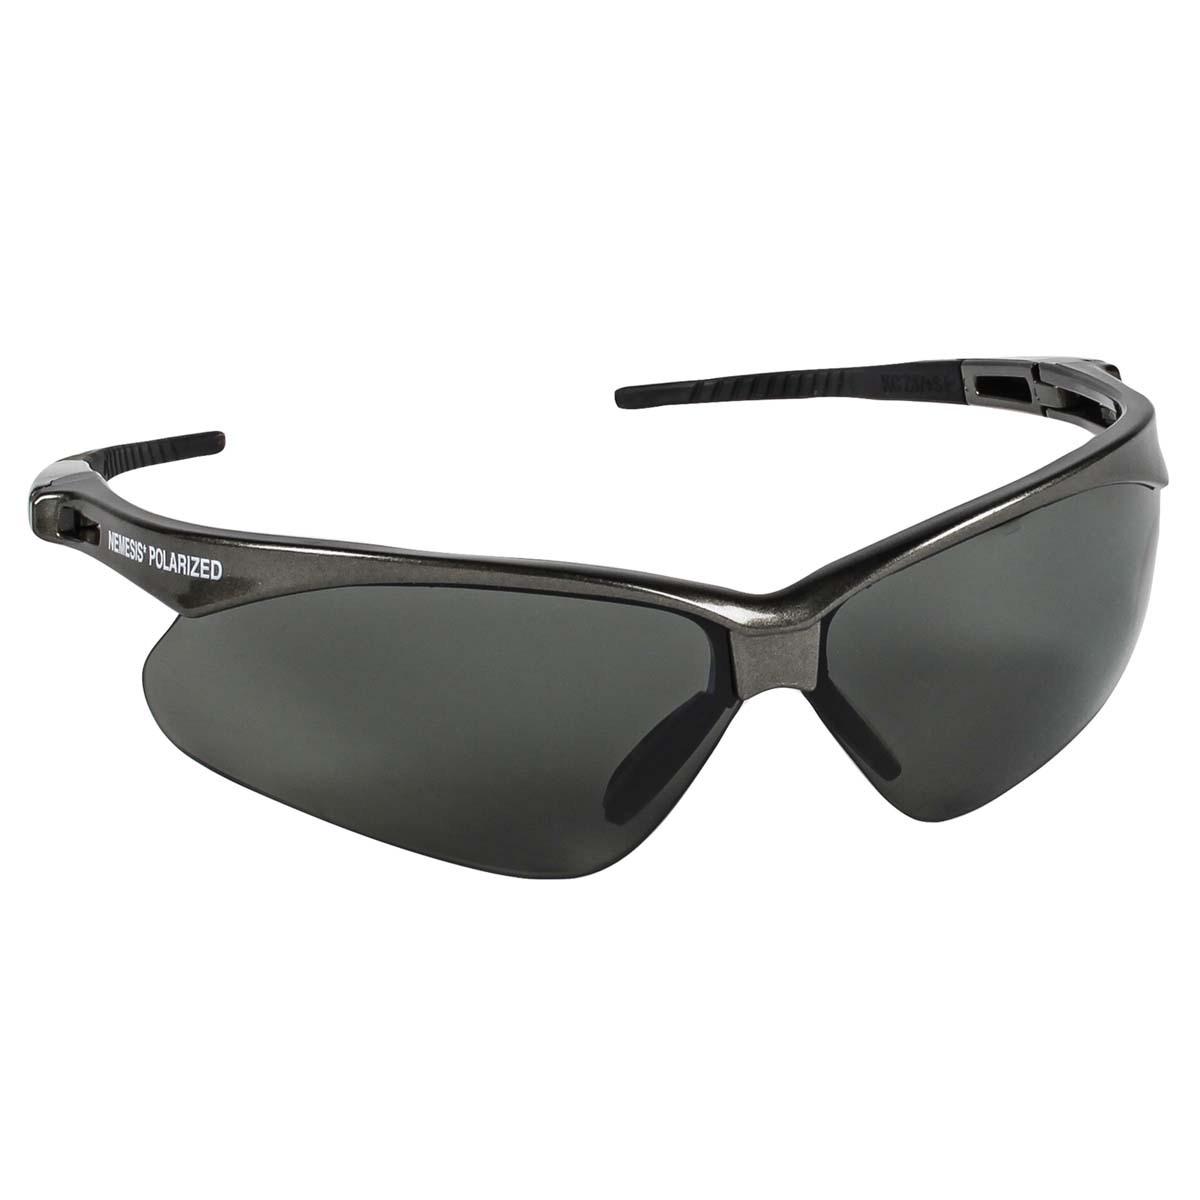 769cc4b8e5 Kimberly-Clark Professional  Jackson Safety  Nemesis  Gunmetal Safety  Glasses With Smoke Polarized